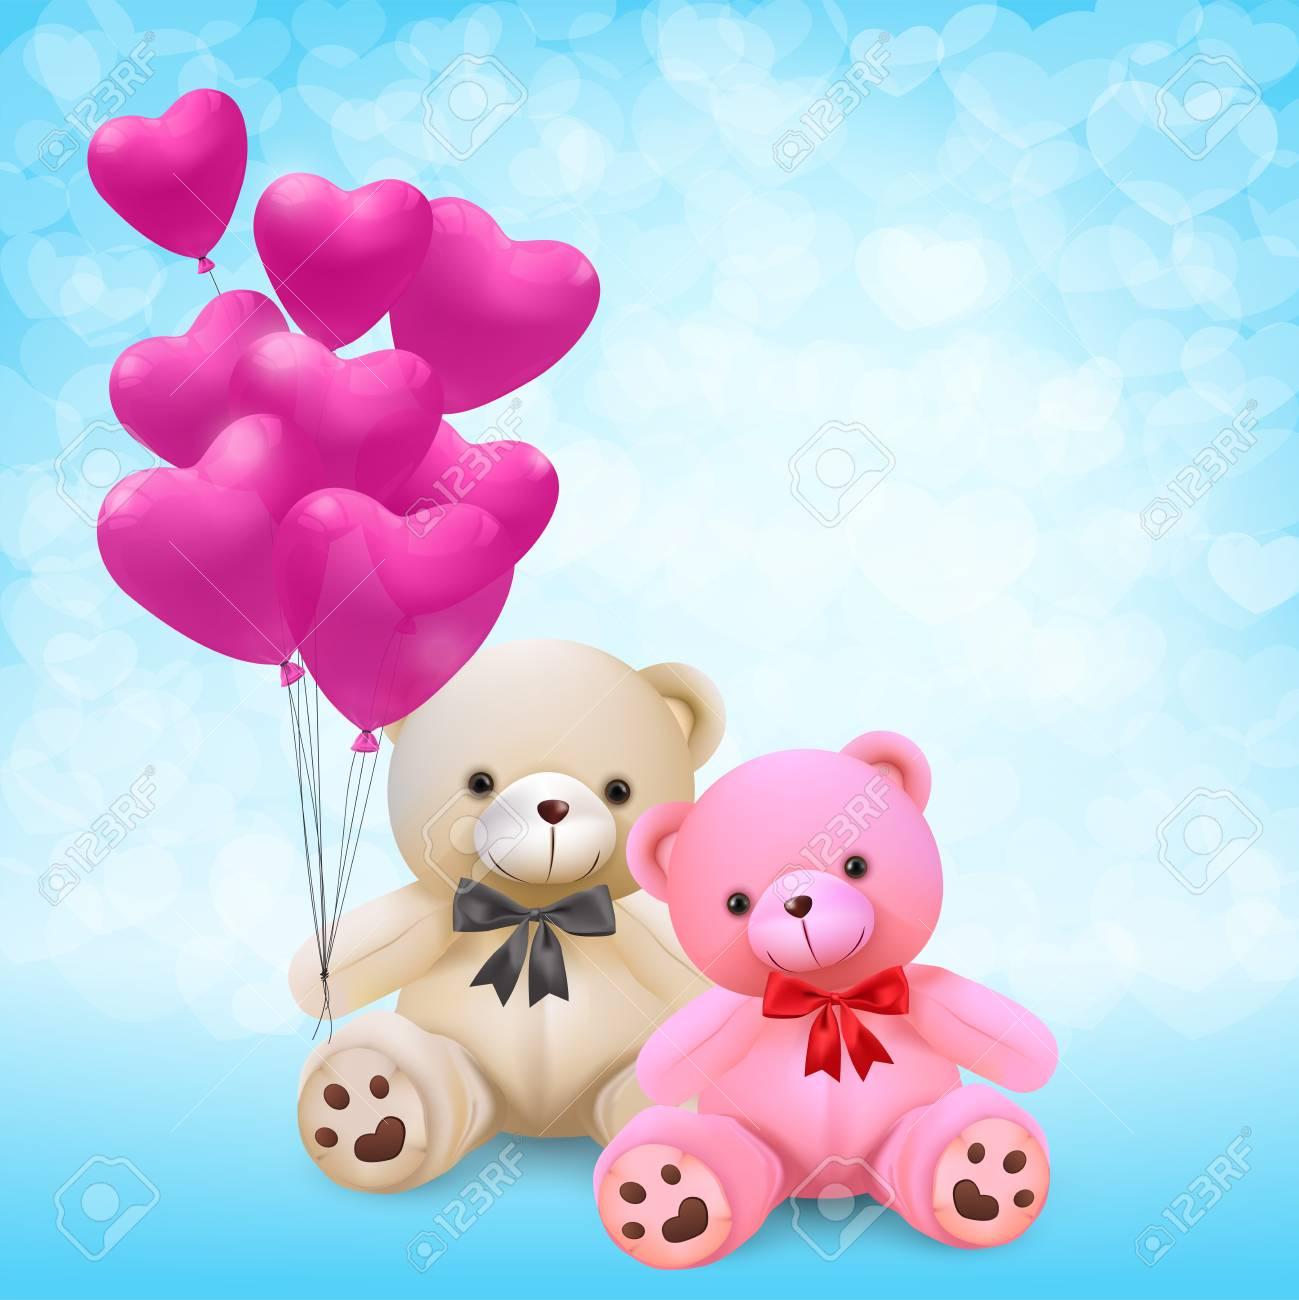 cute teddy bear holding pink heart balloons - vector and